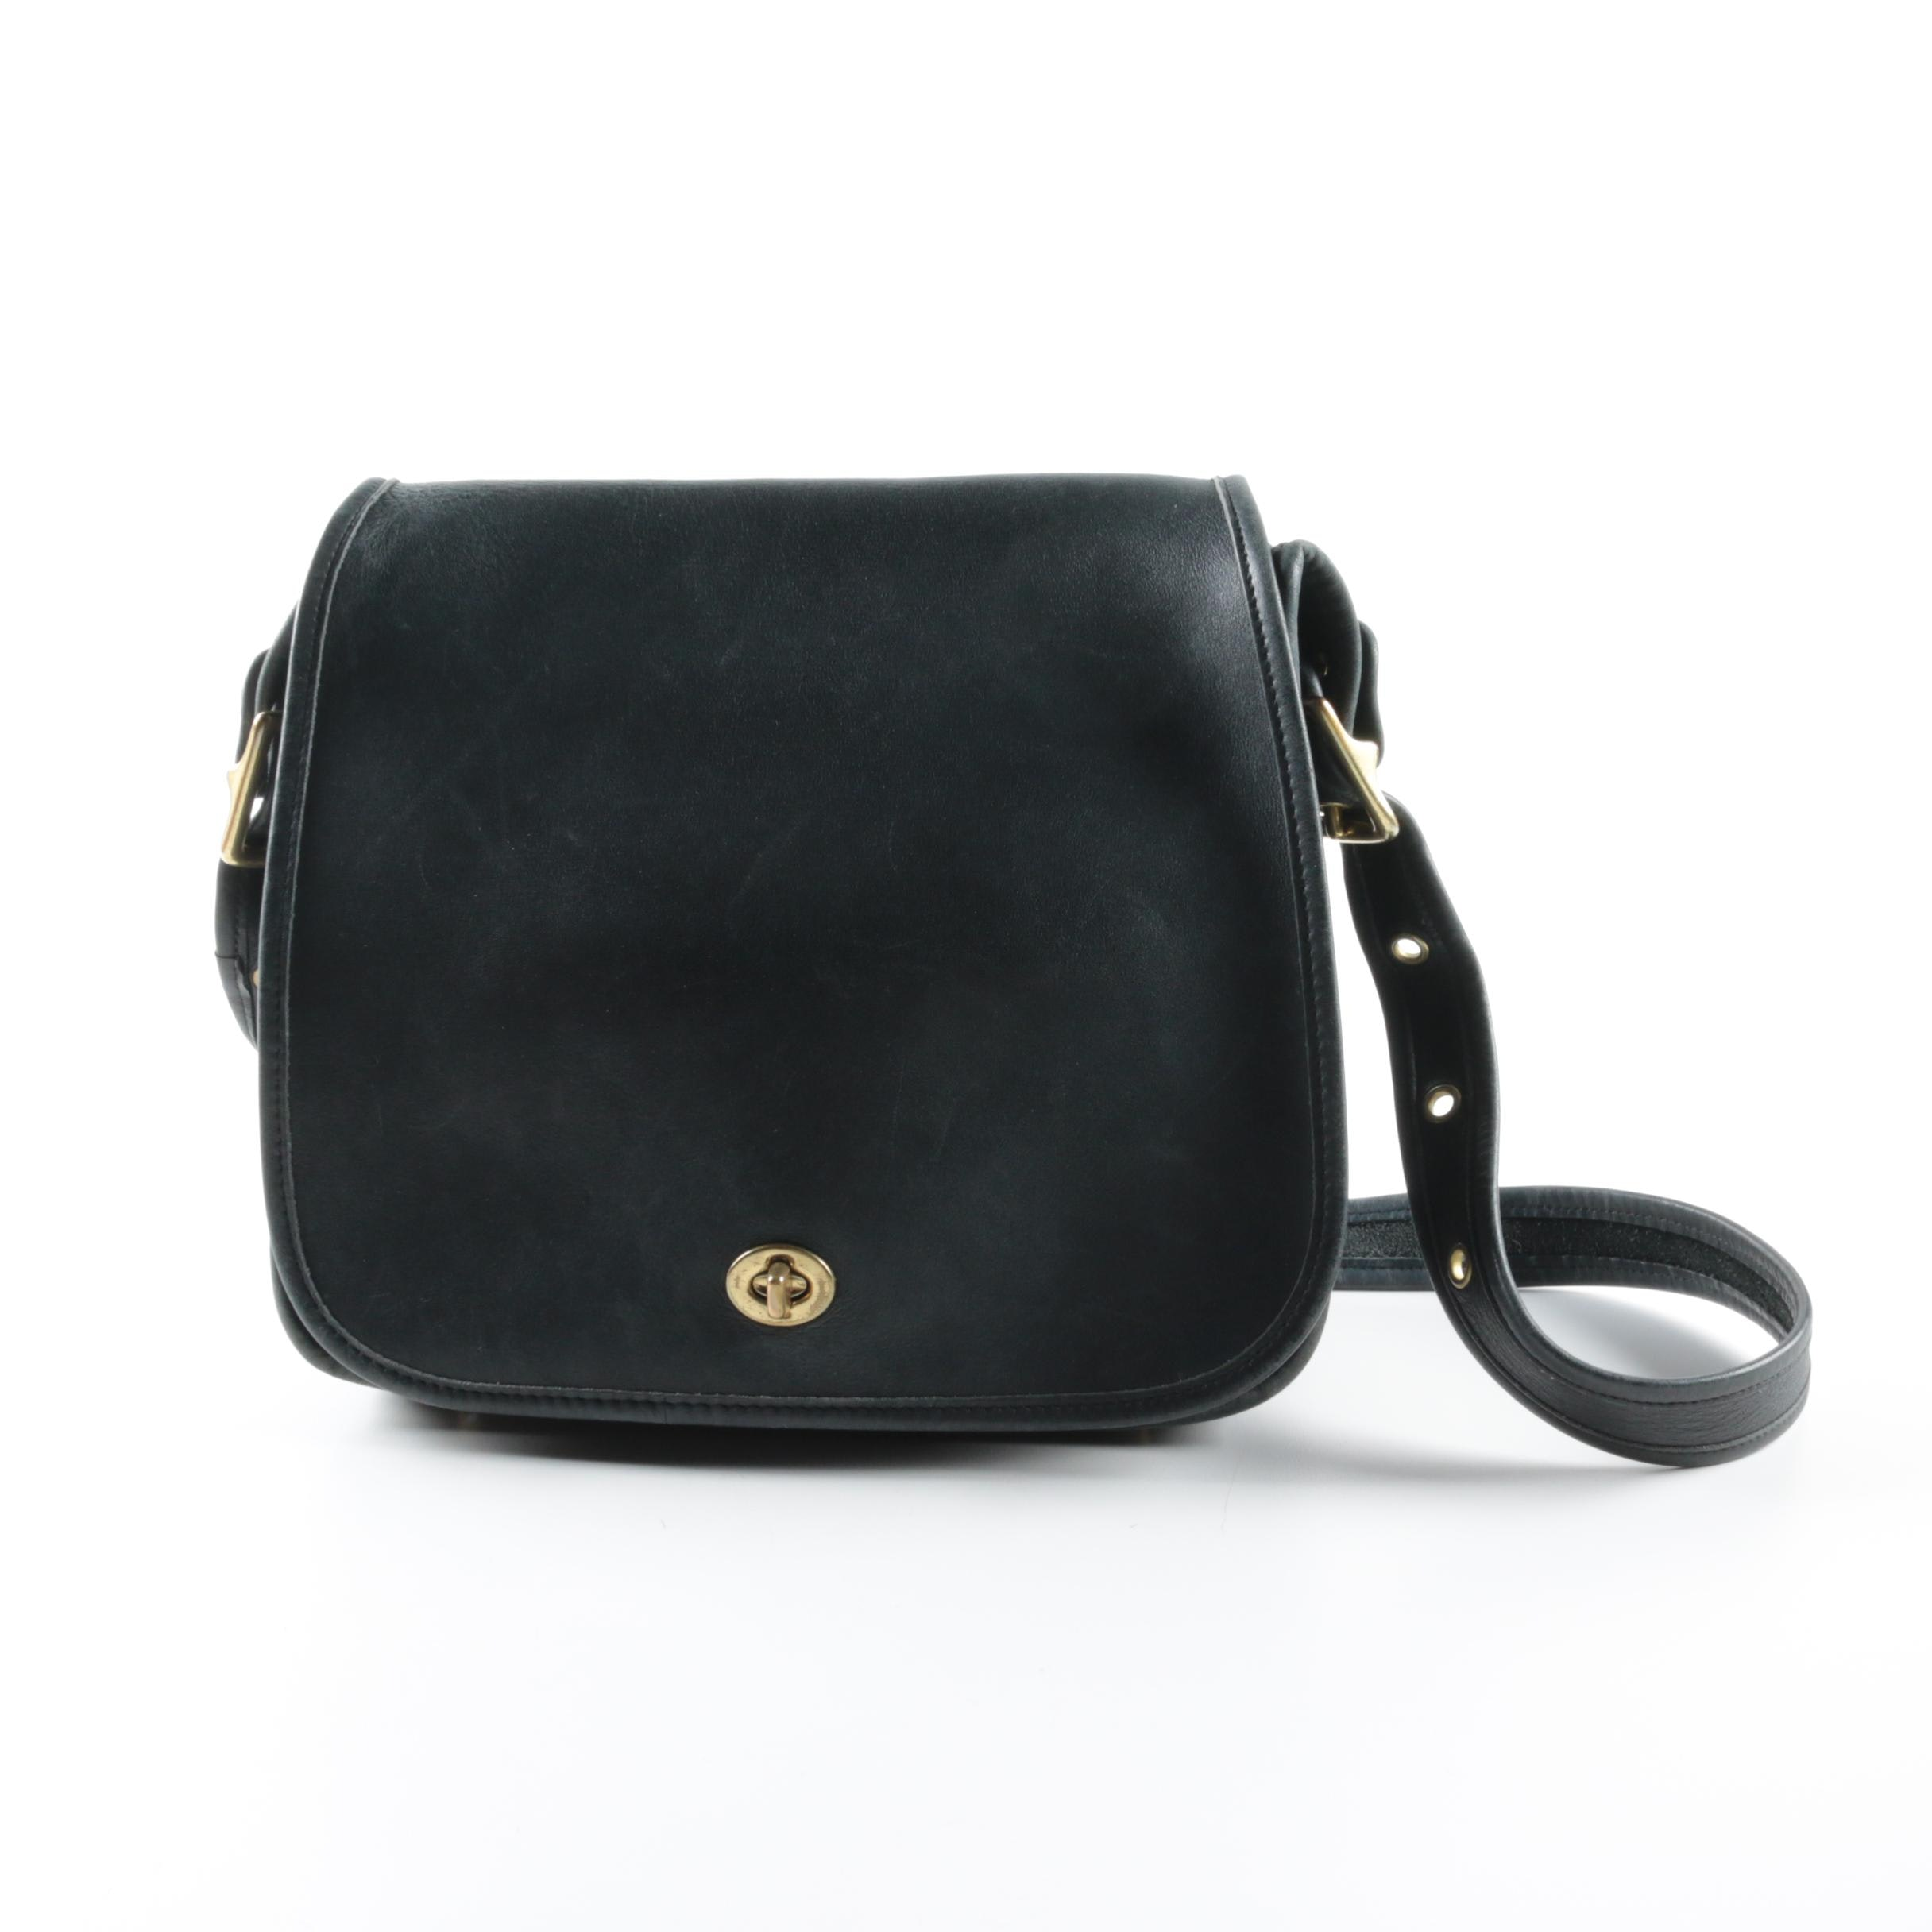 Vintage Coach Stewardess Black Leather Handbag